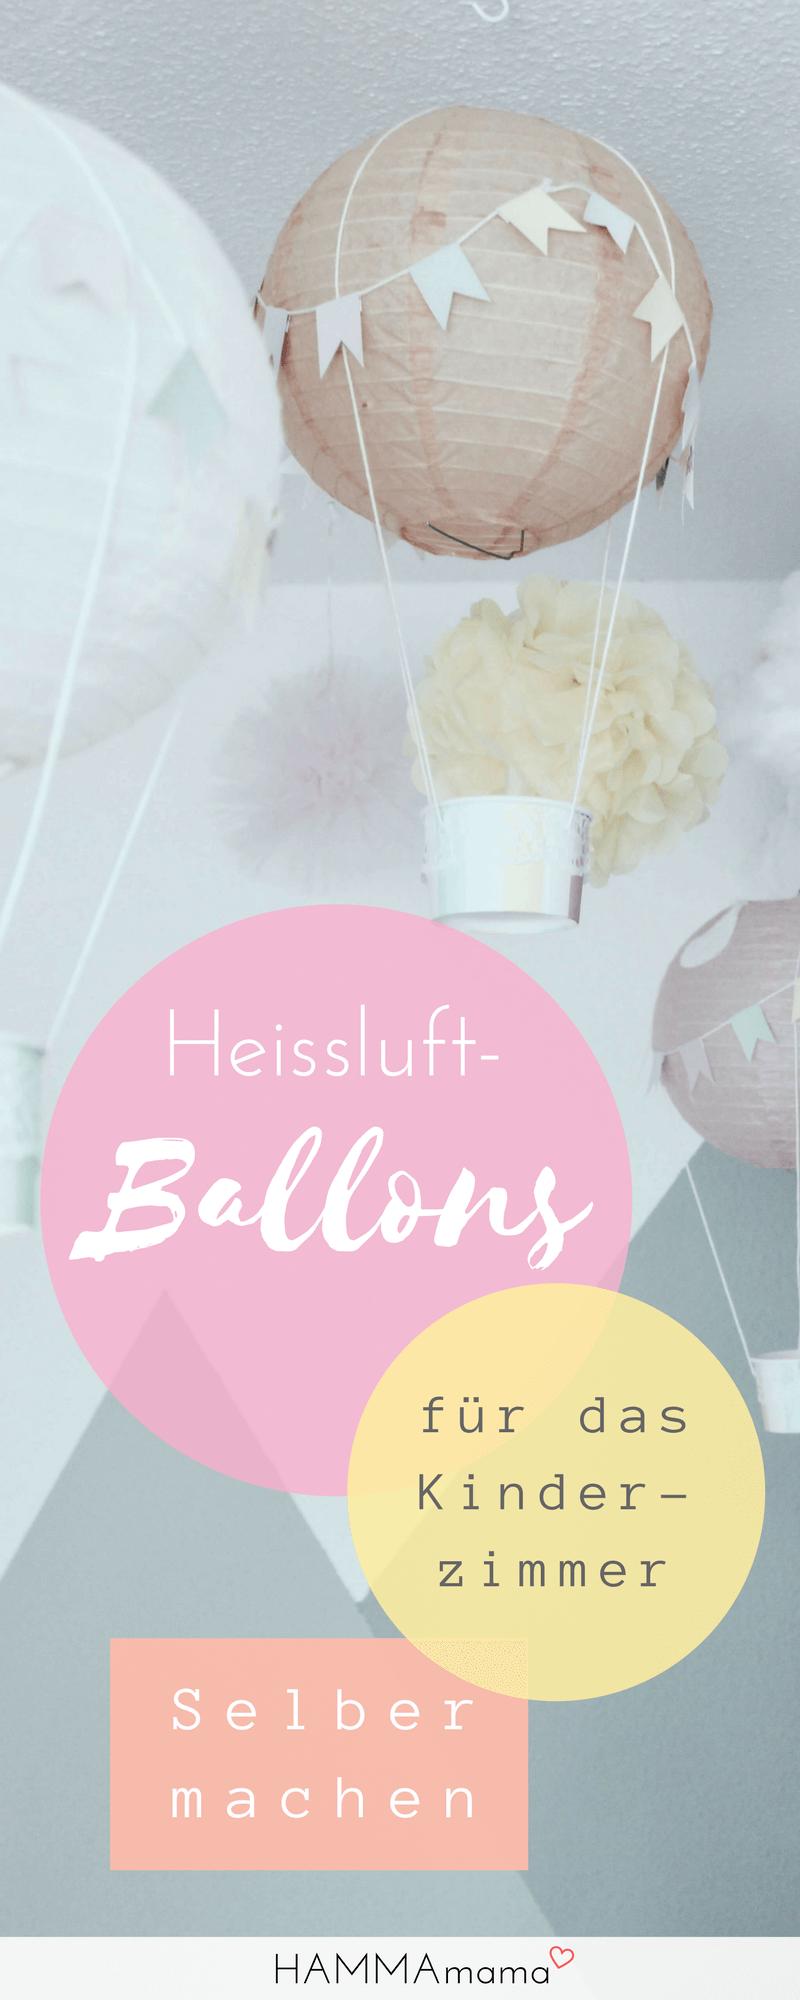 diy deko idee hei luftballons f r das kinderzimmer selber machen hei luftballon. Black Bedroom Furniture Sets. Home Design Ideas